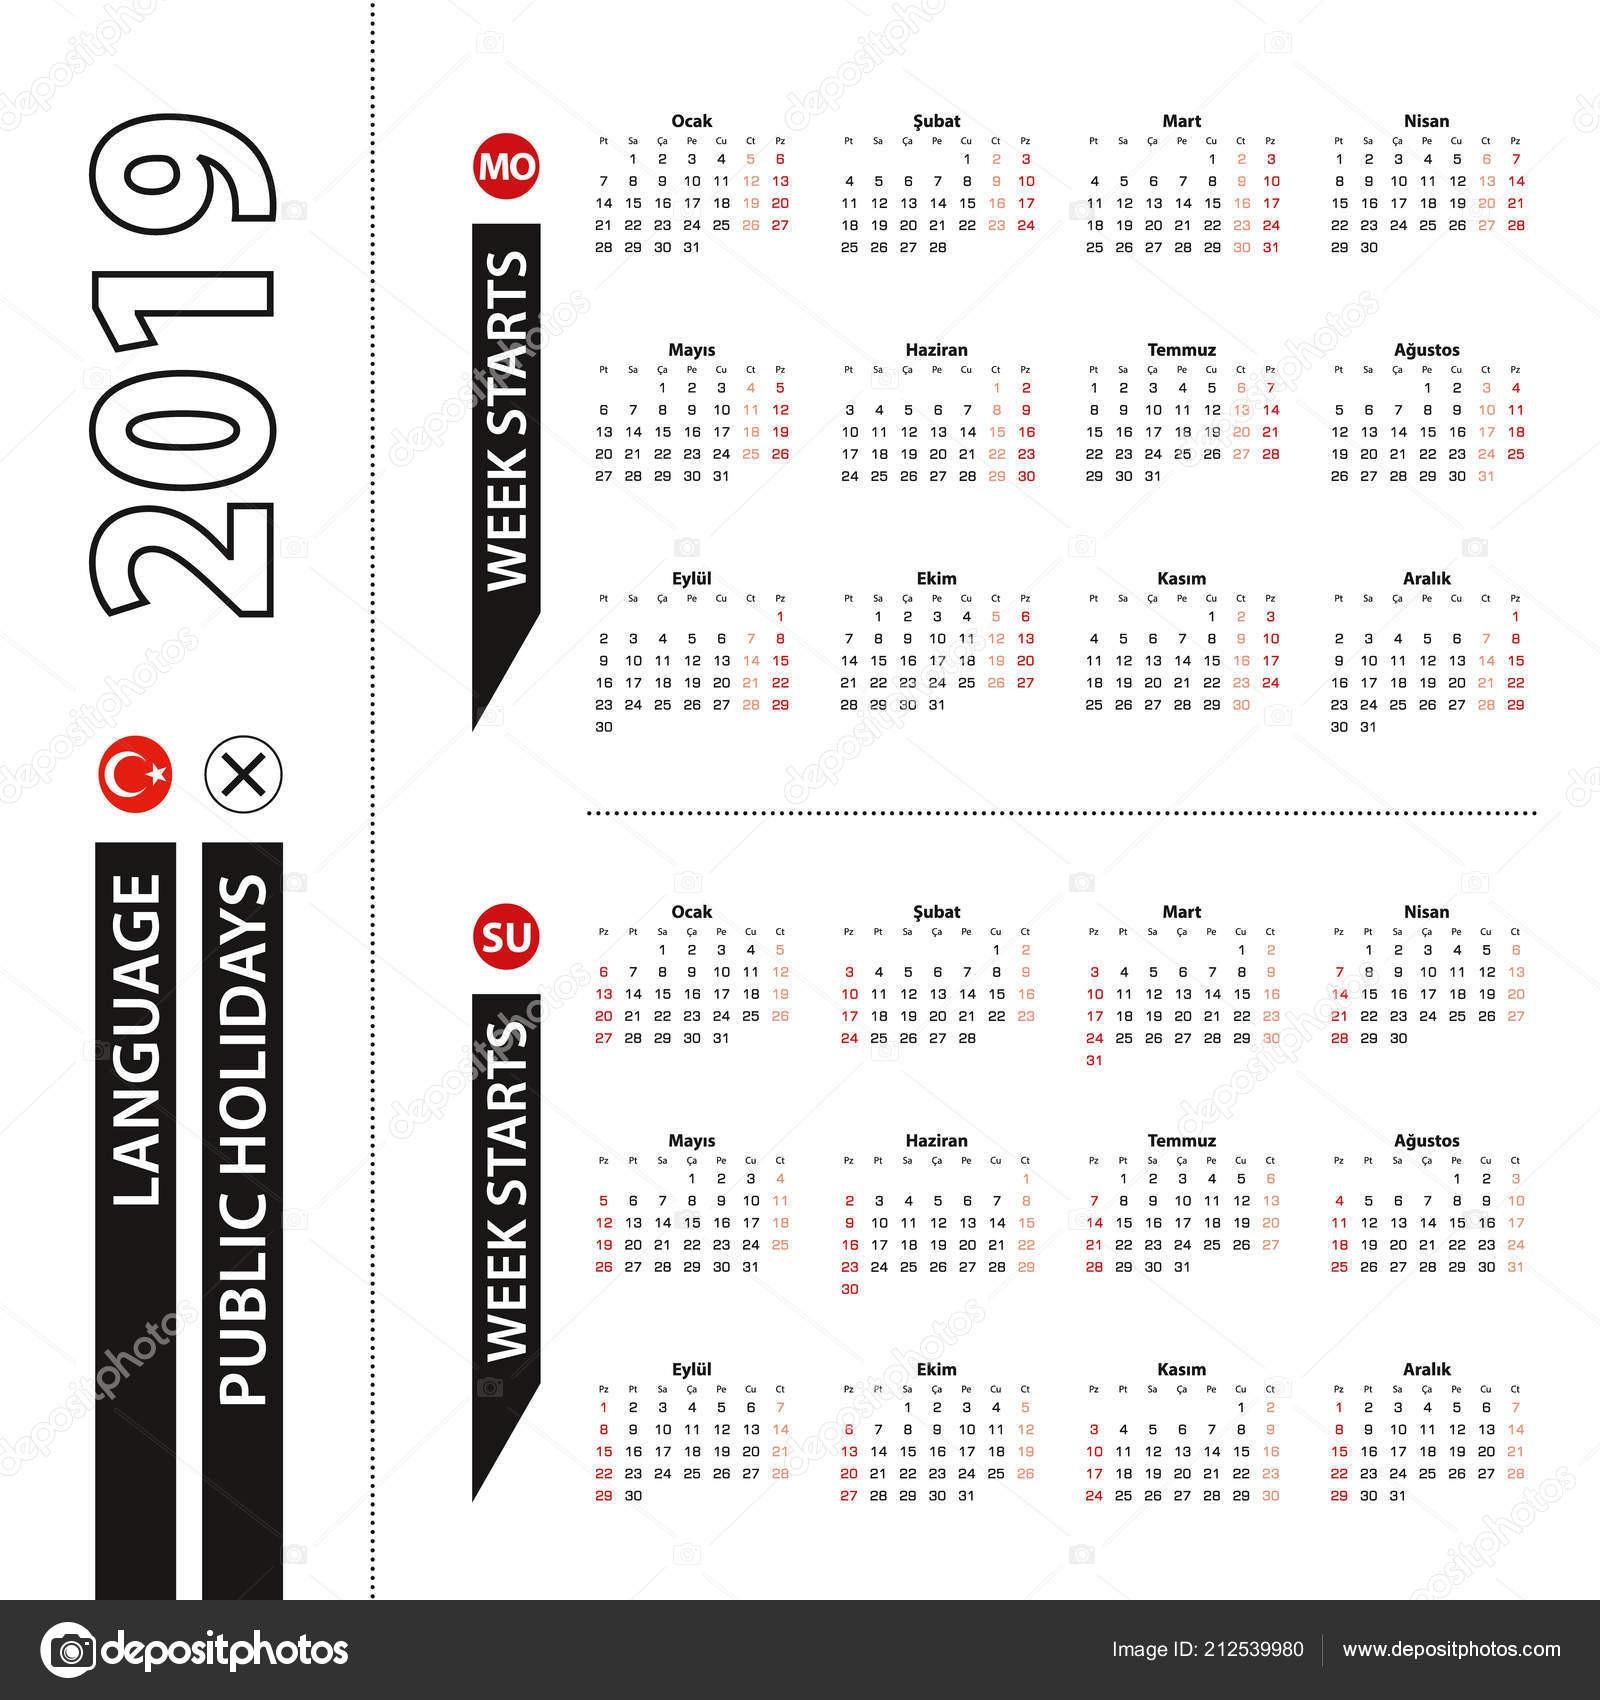 depositphotos stock illustration two versions 2019 calendar turkish